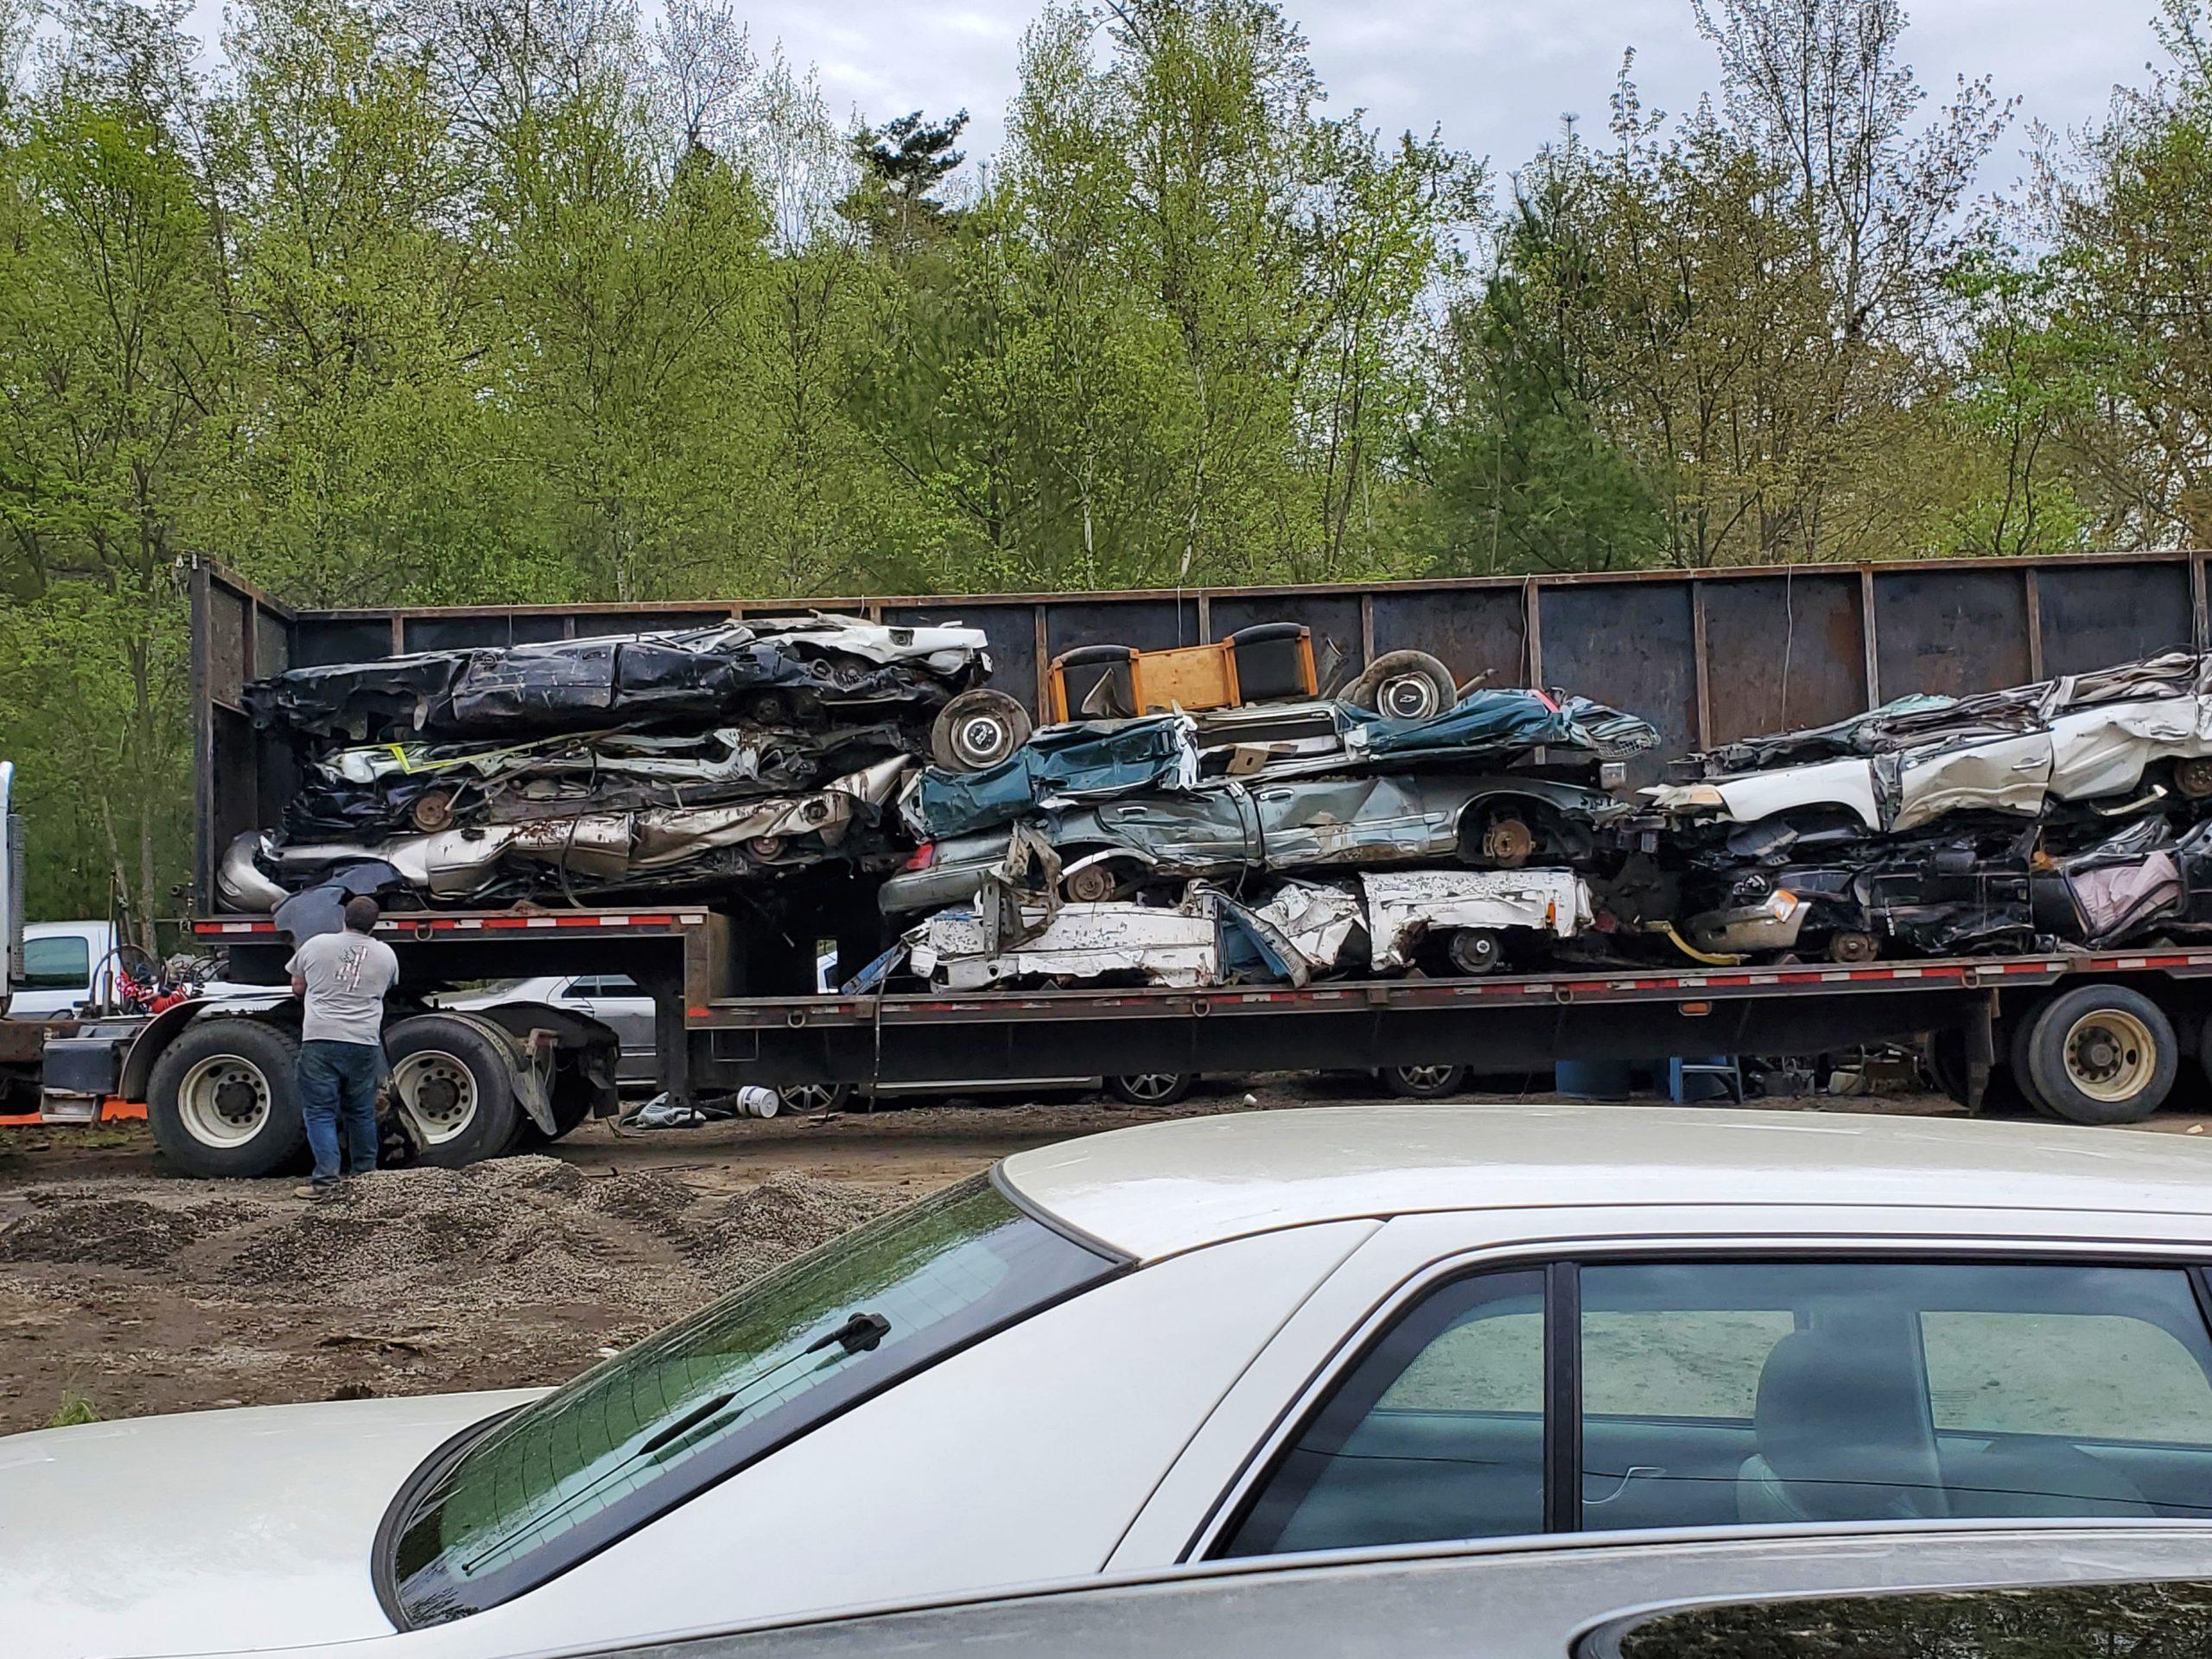 Car scrapyard near Wakefield MA